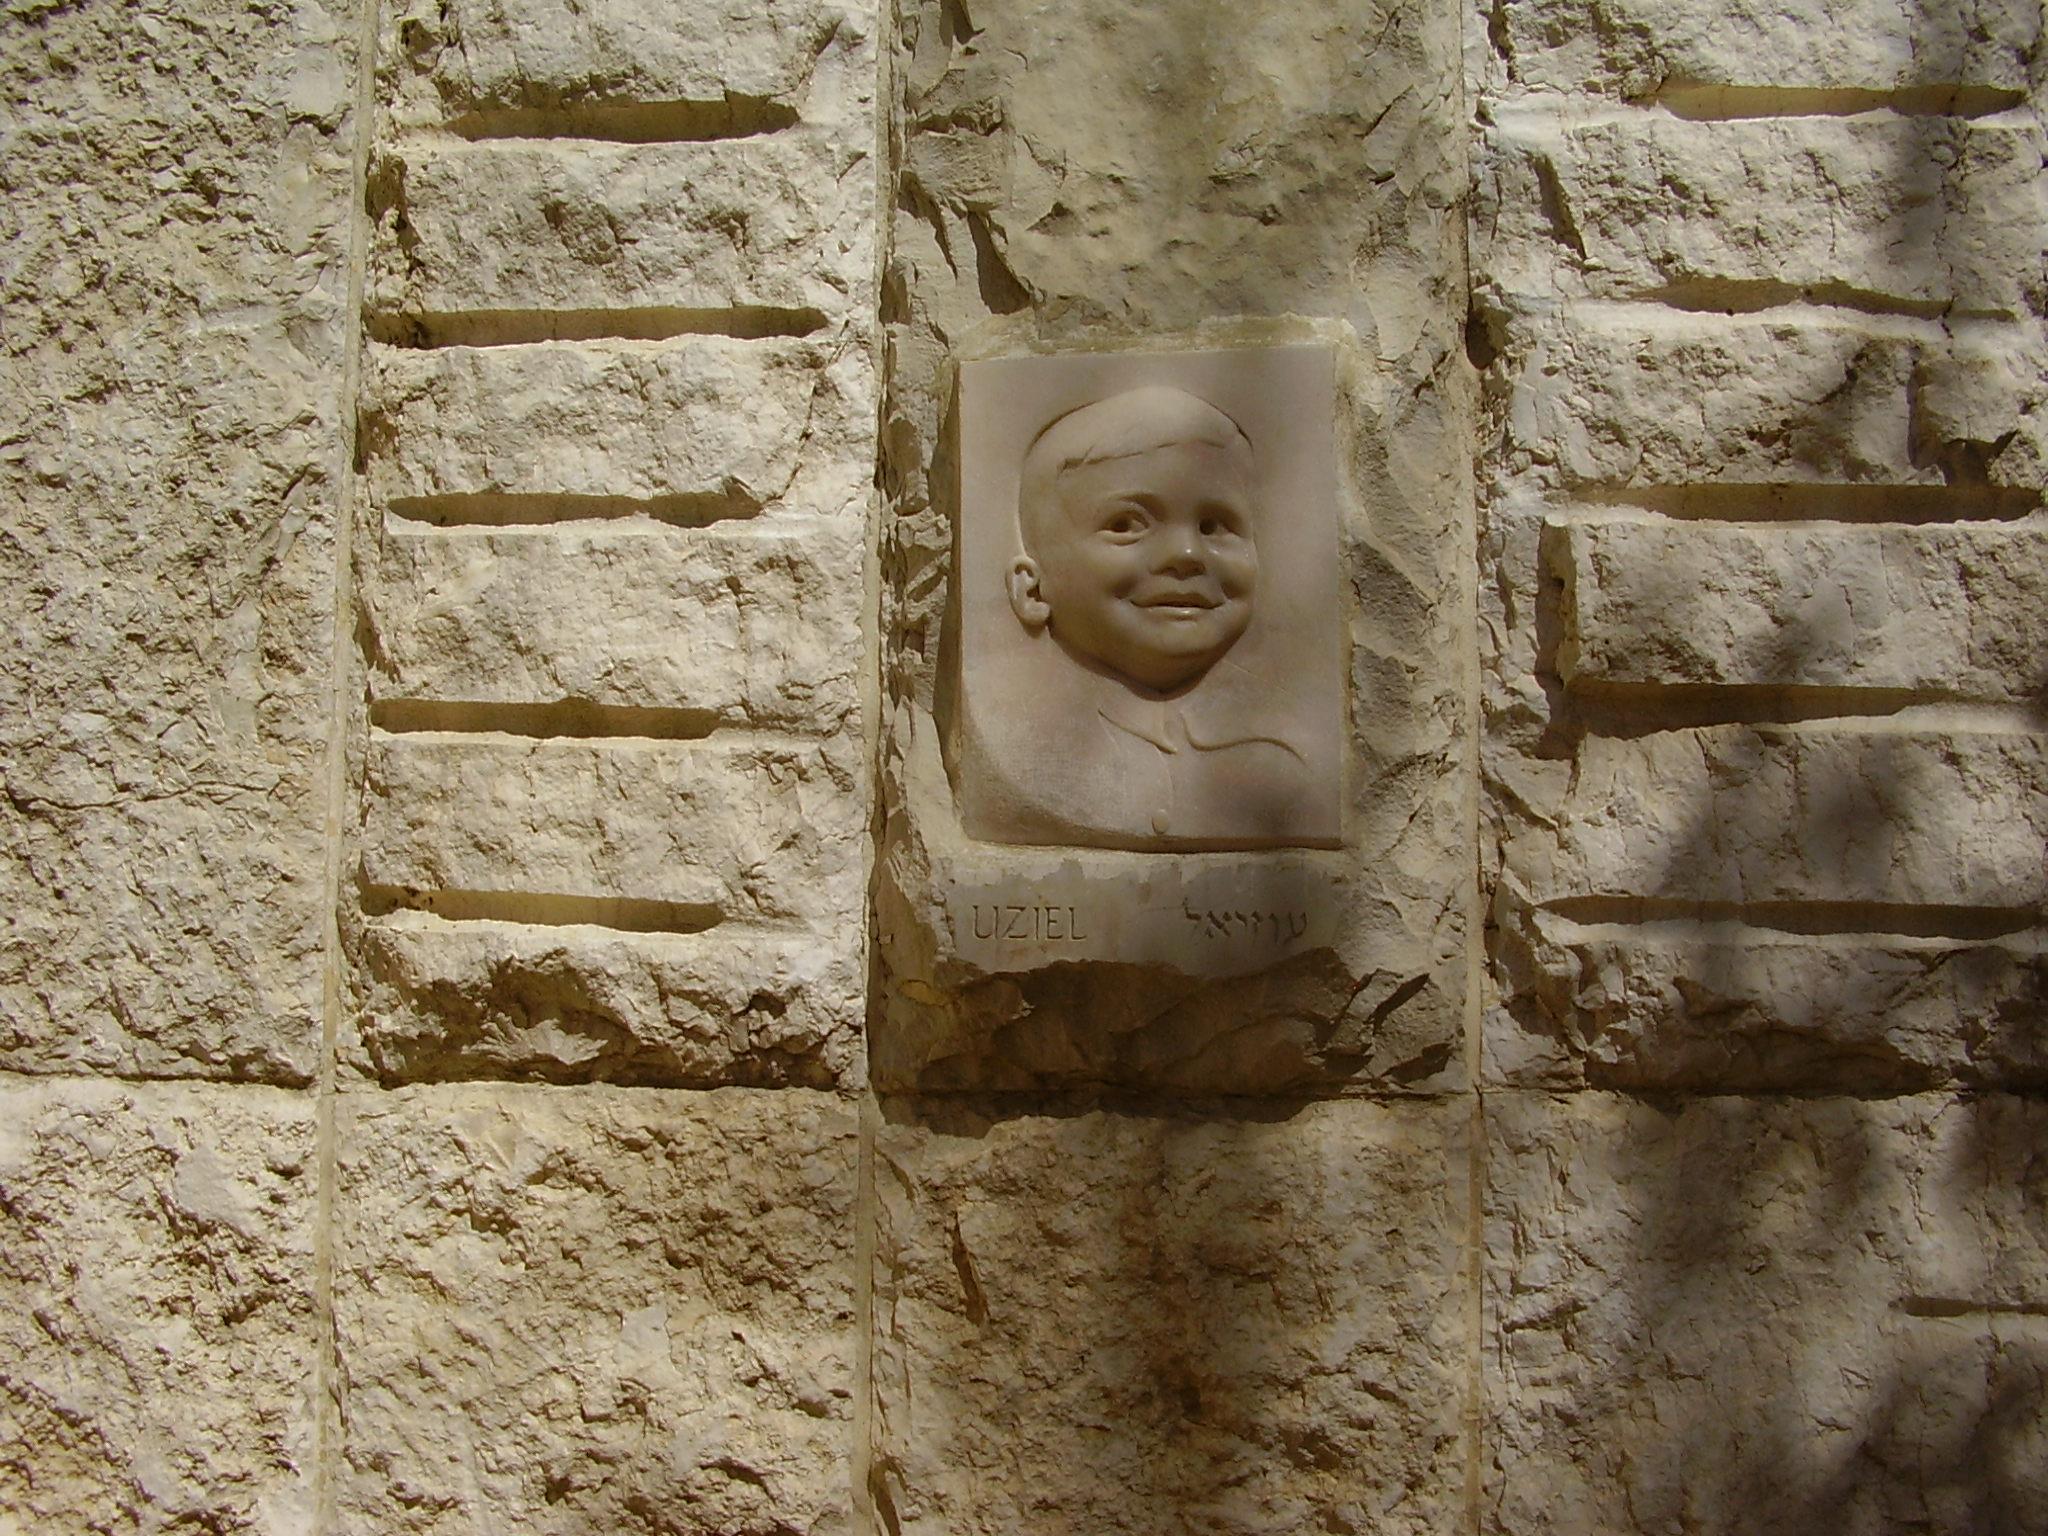 File:PikiWiki Israel 12500 childre holocaust memorial at yad